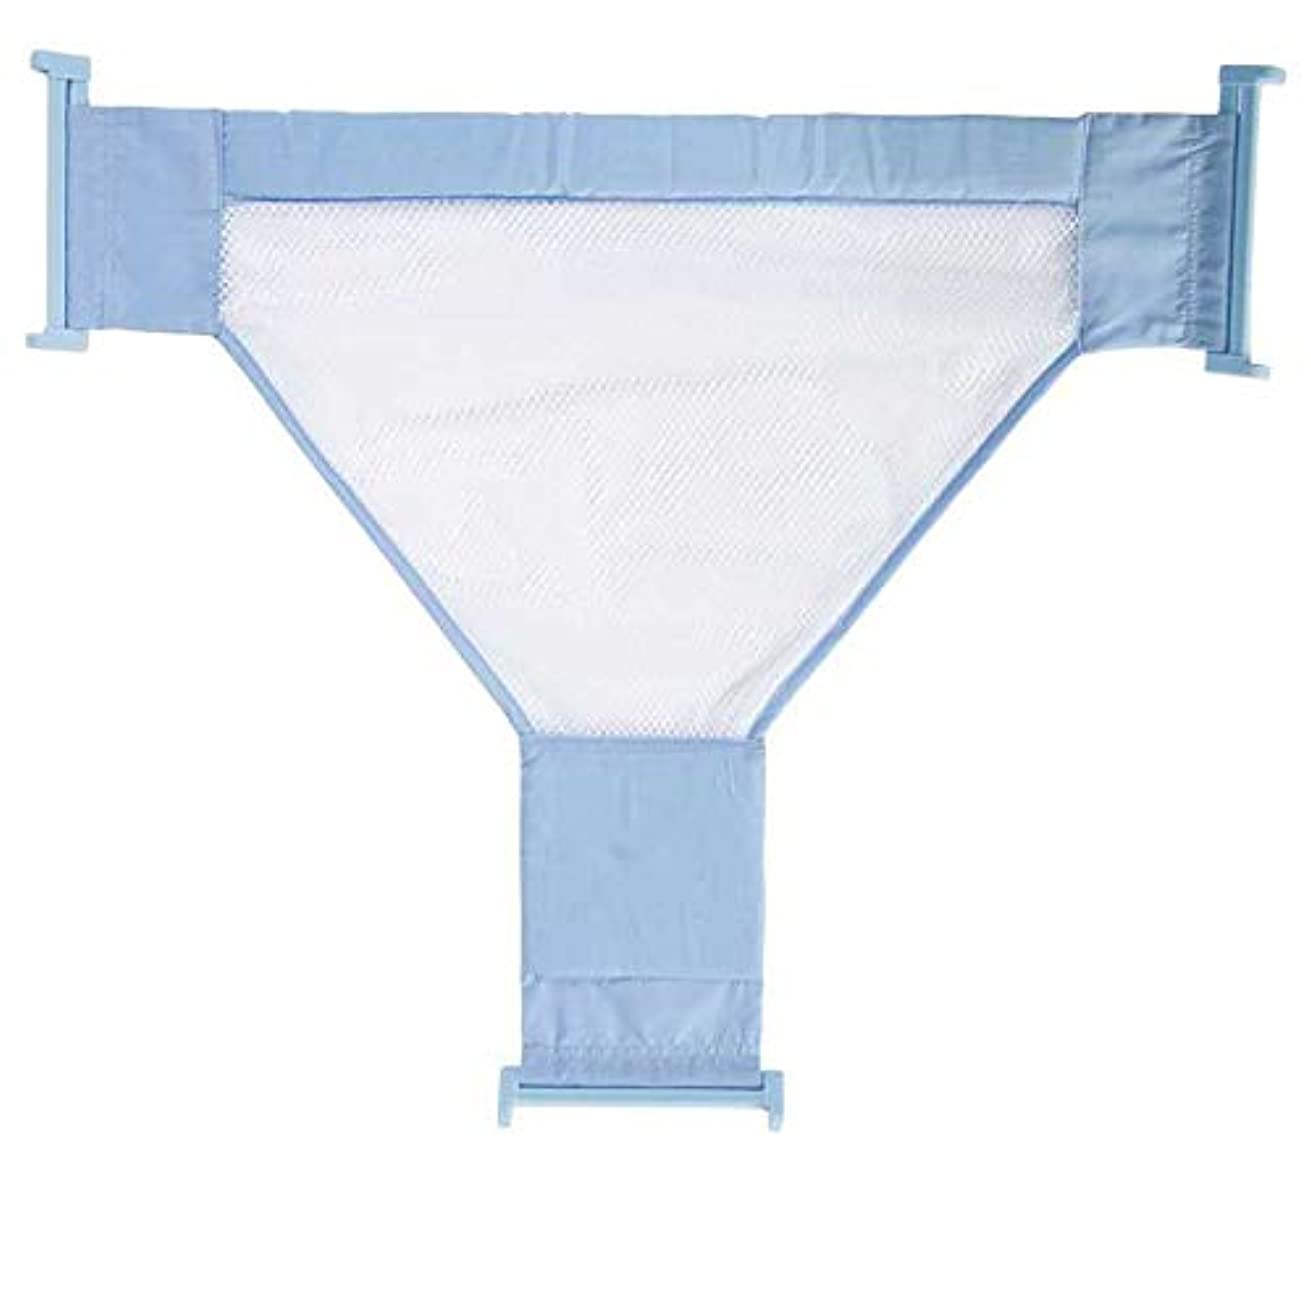 OniorT型 調節可能 浴室 ネット 安全 防護 浴槽網 ネットカバー 入浴 サスペンダー 滑り止め 浴槽網 青